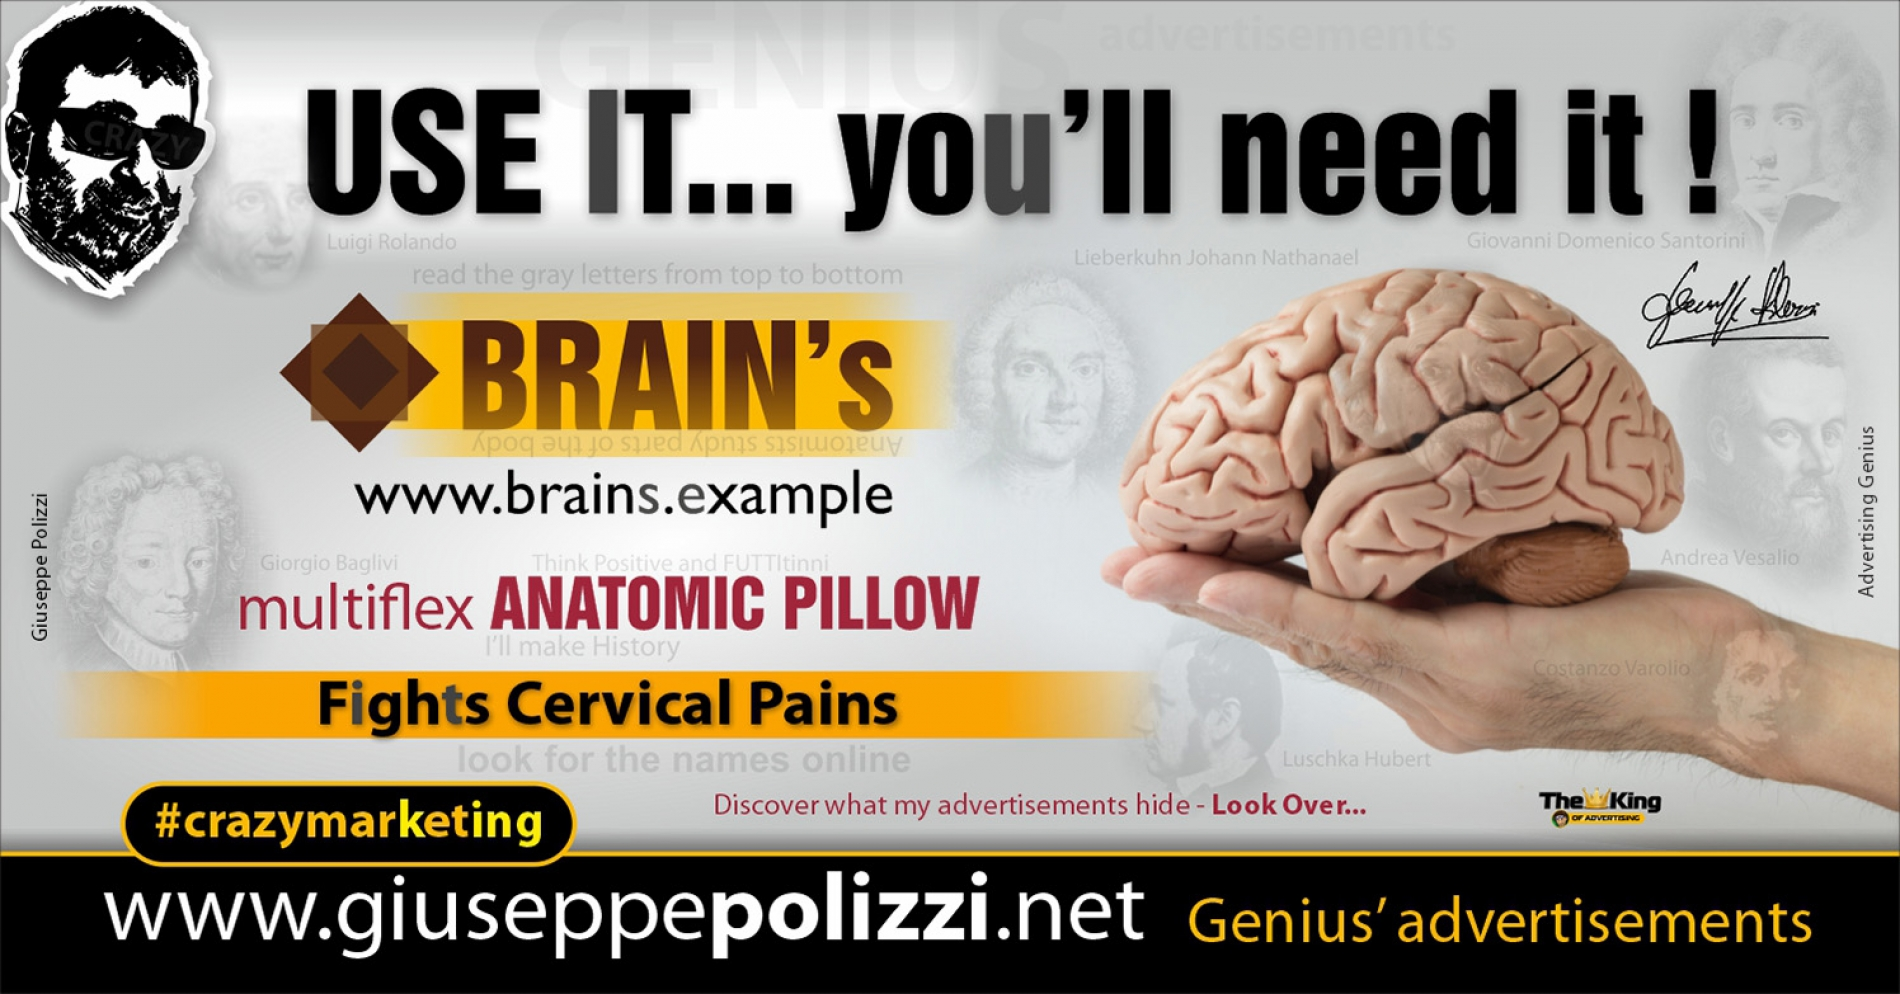 Giuseppe Polizzi Crazymarketing Use it advertisements